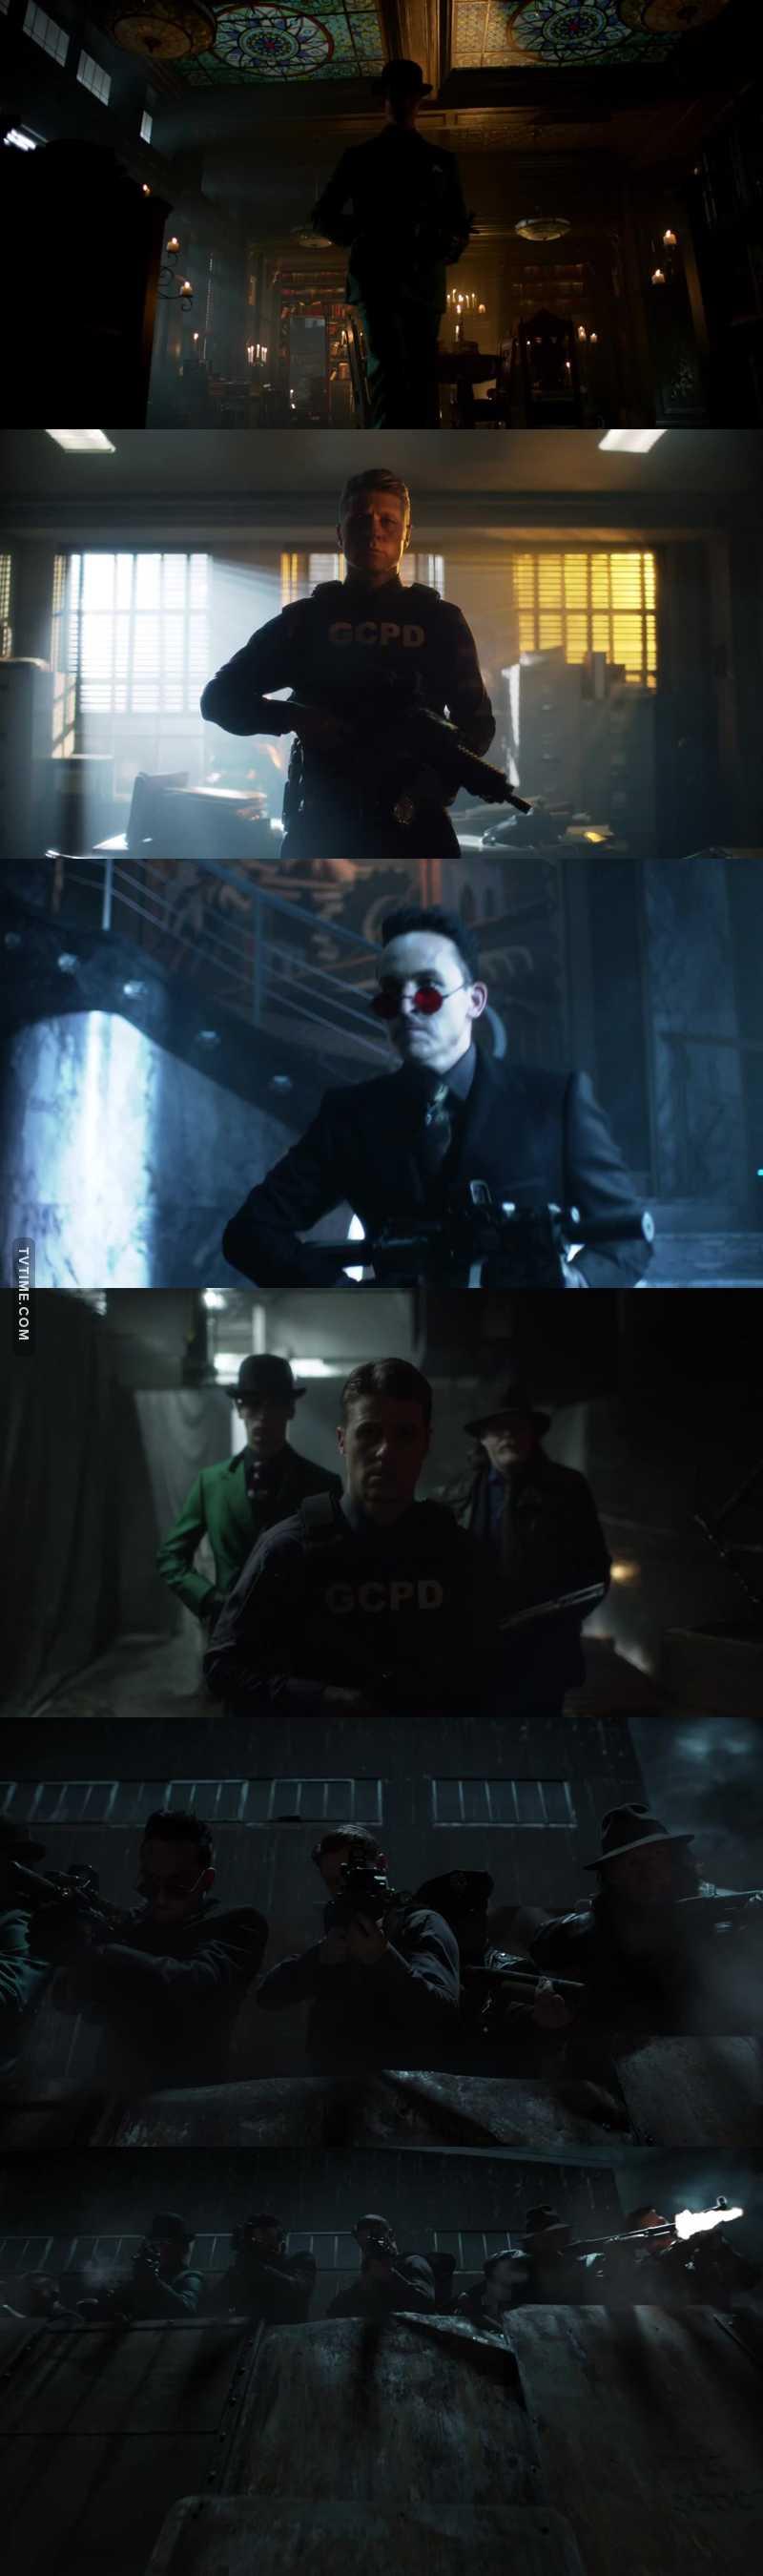 This is Gotham Man